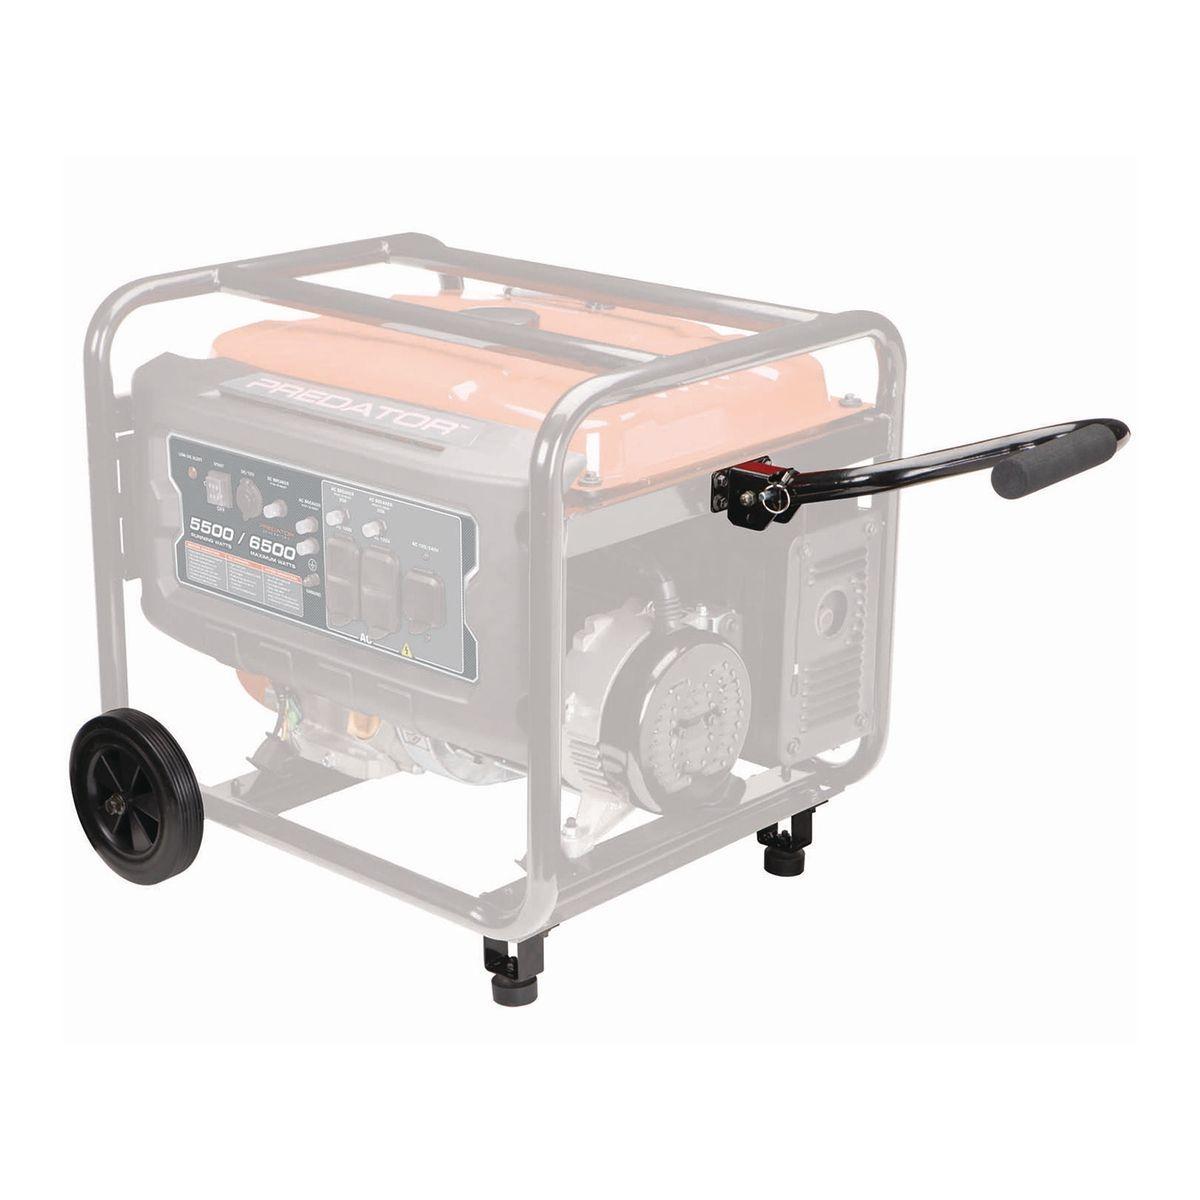 PREDATOR 8 in. Never-Flat Generator Wheel Kit - Item 68531 / 61486